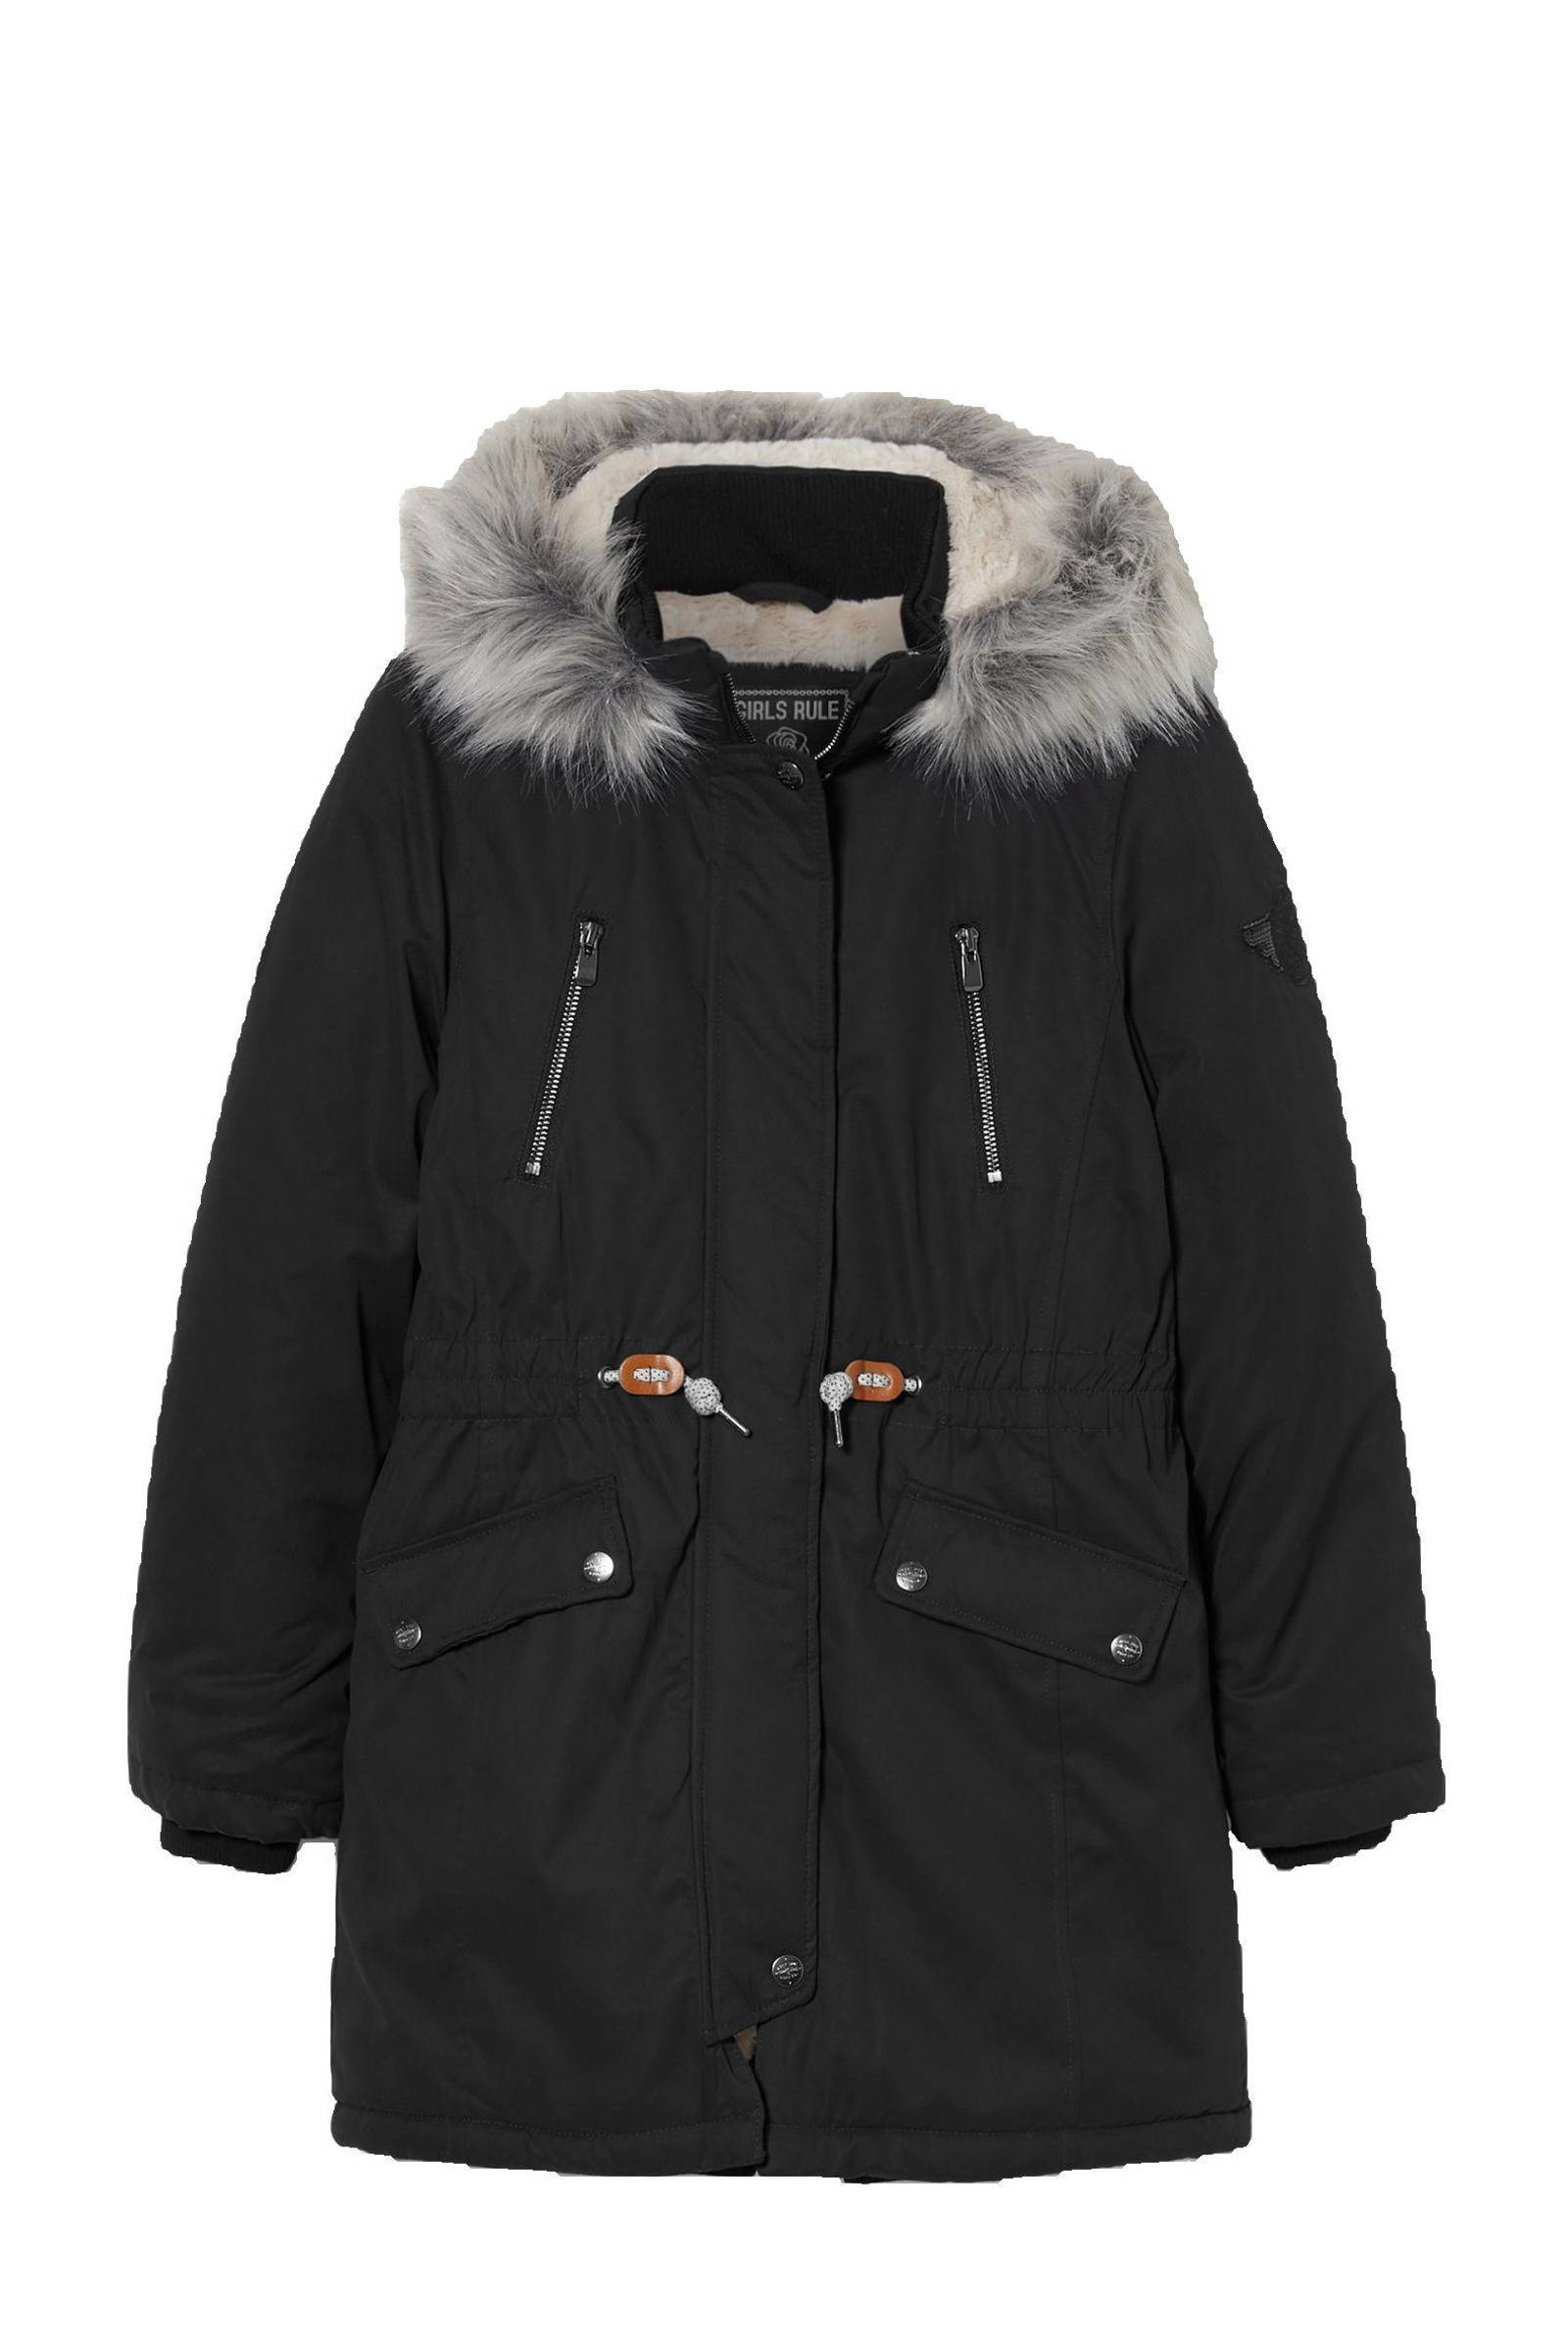 C&A Here & There gemêleerde jas grijs | wehkamp